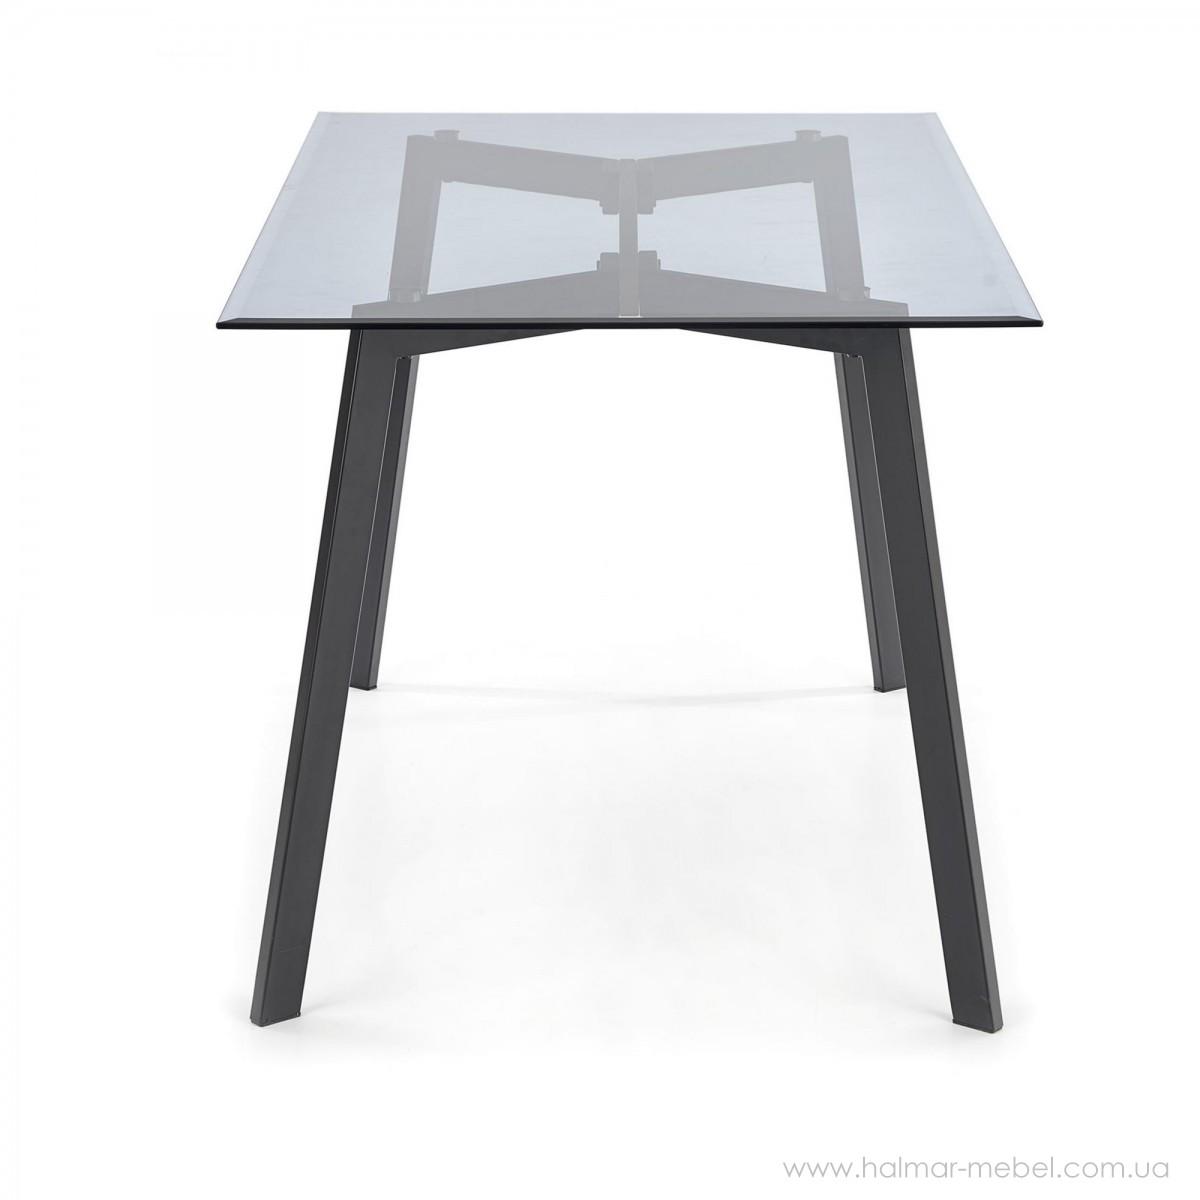 Стол стеклянный TRAX HALMAR